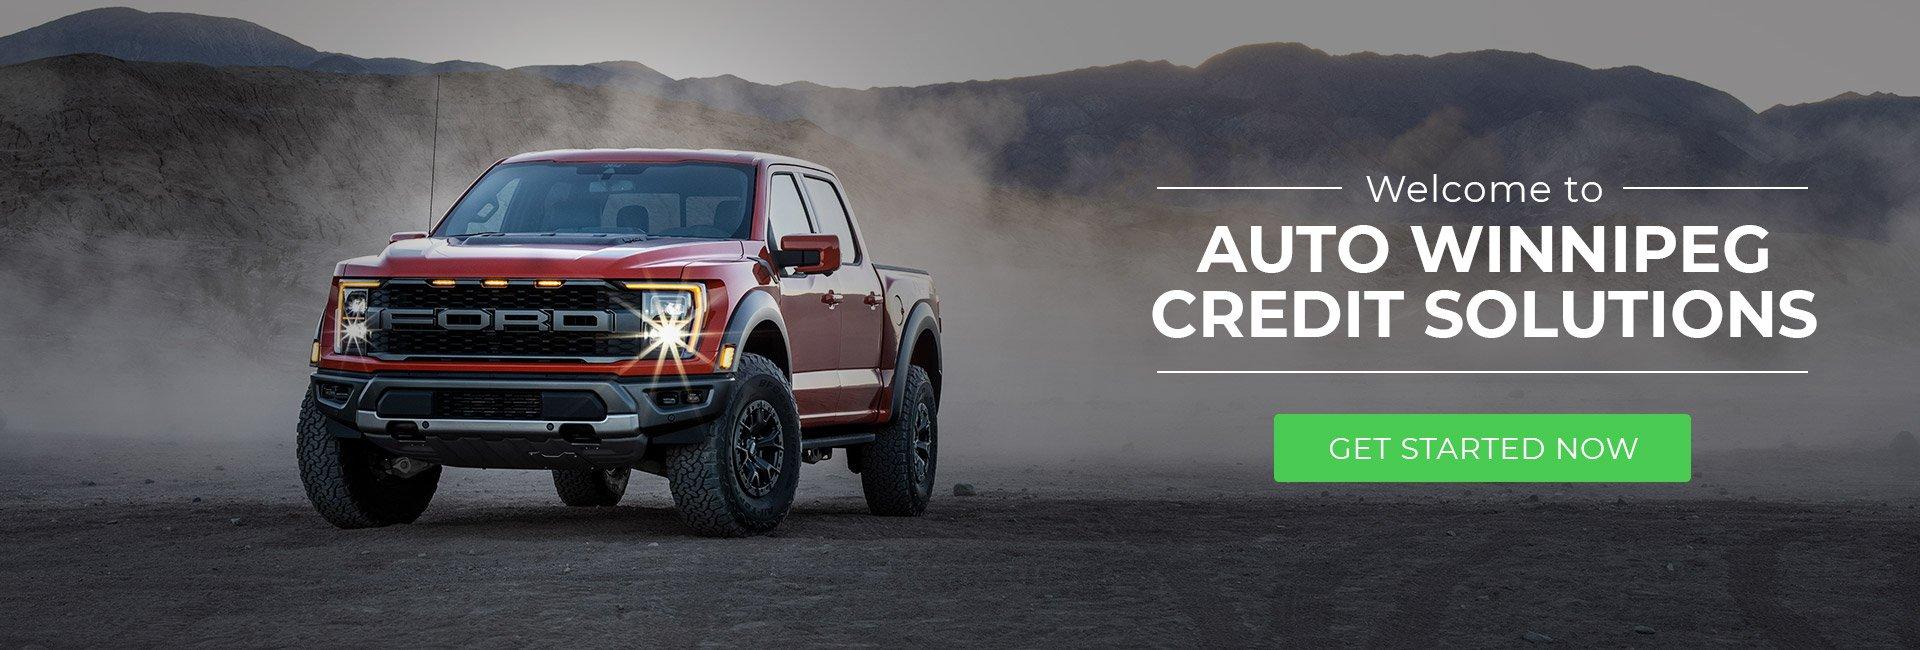 Auto Winnipeg Credit Solutions